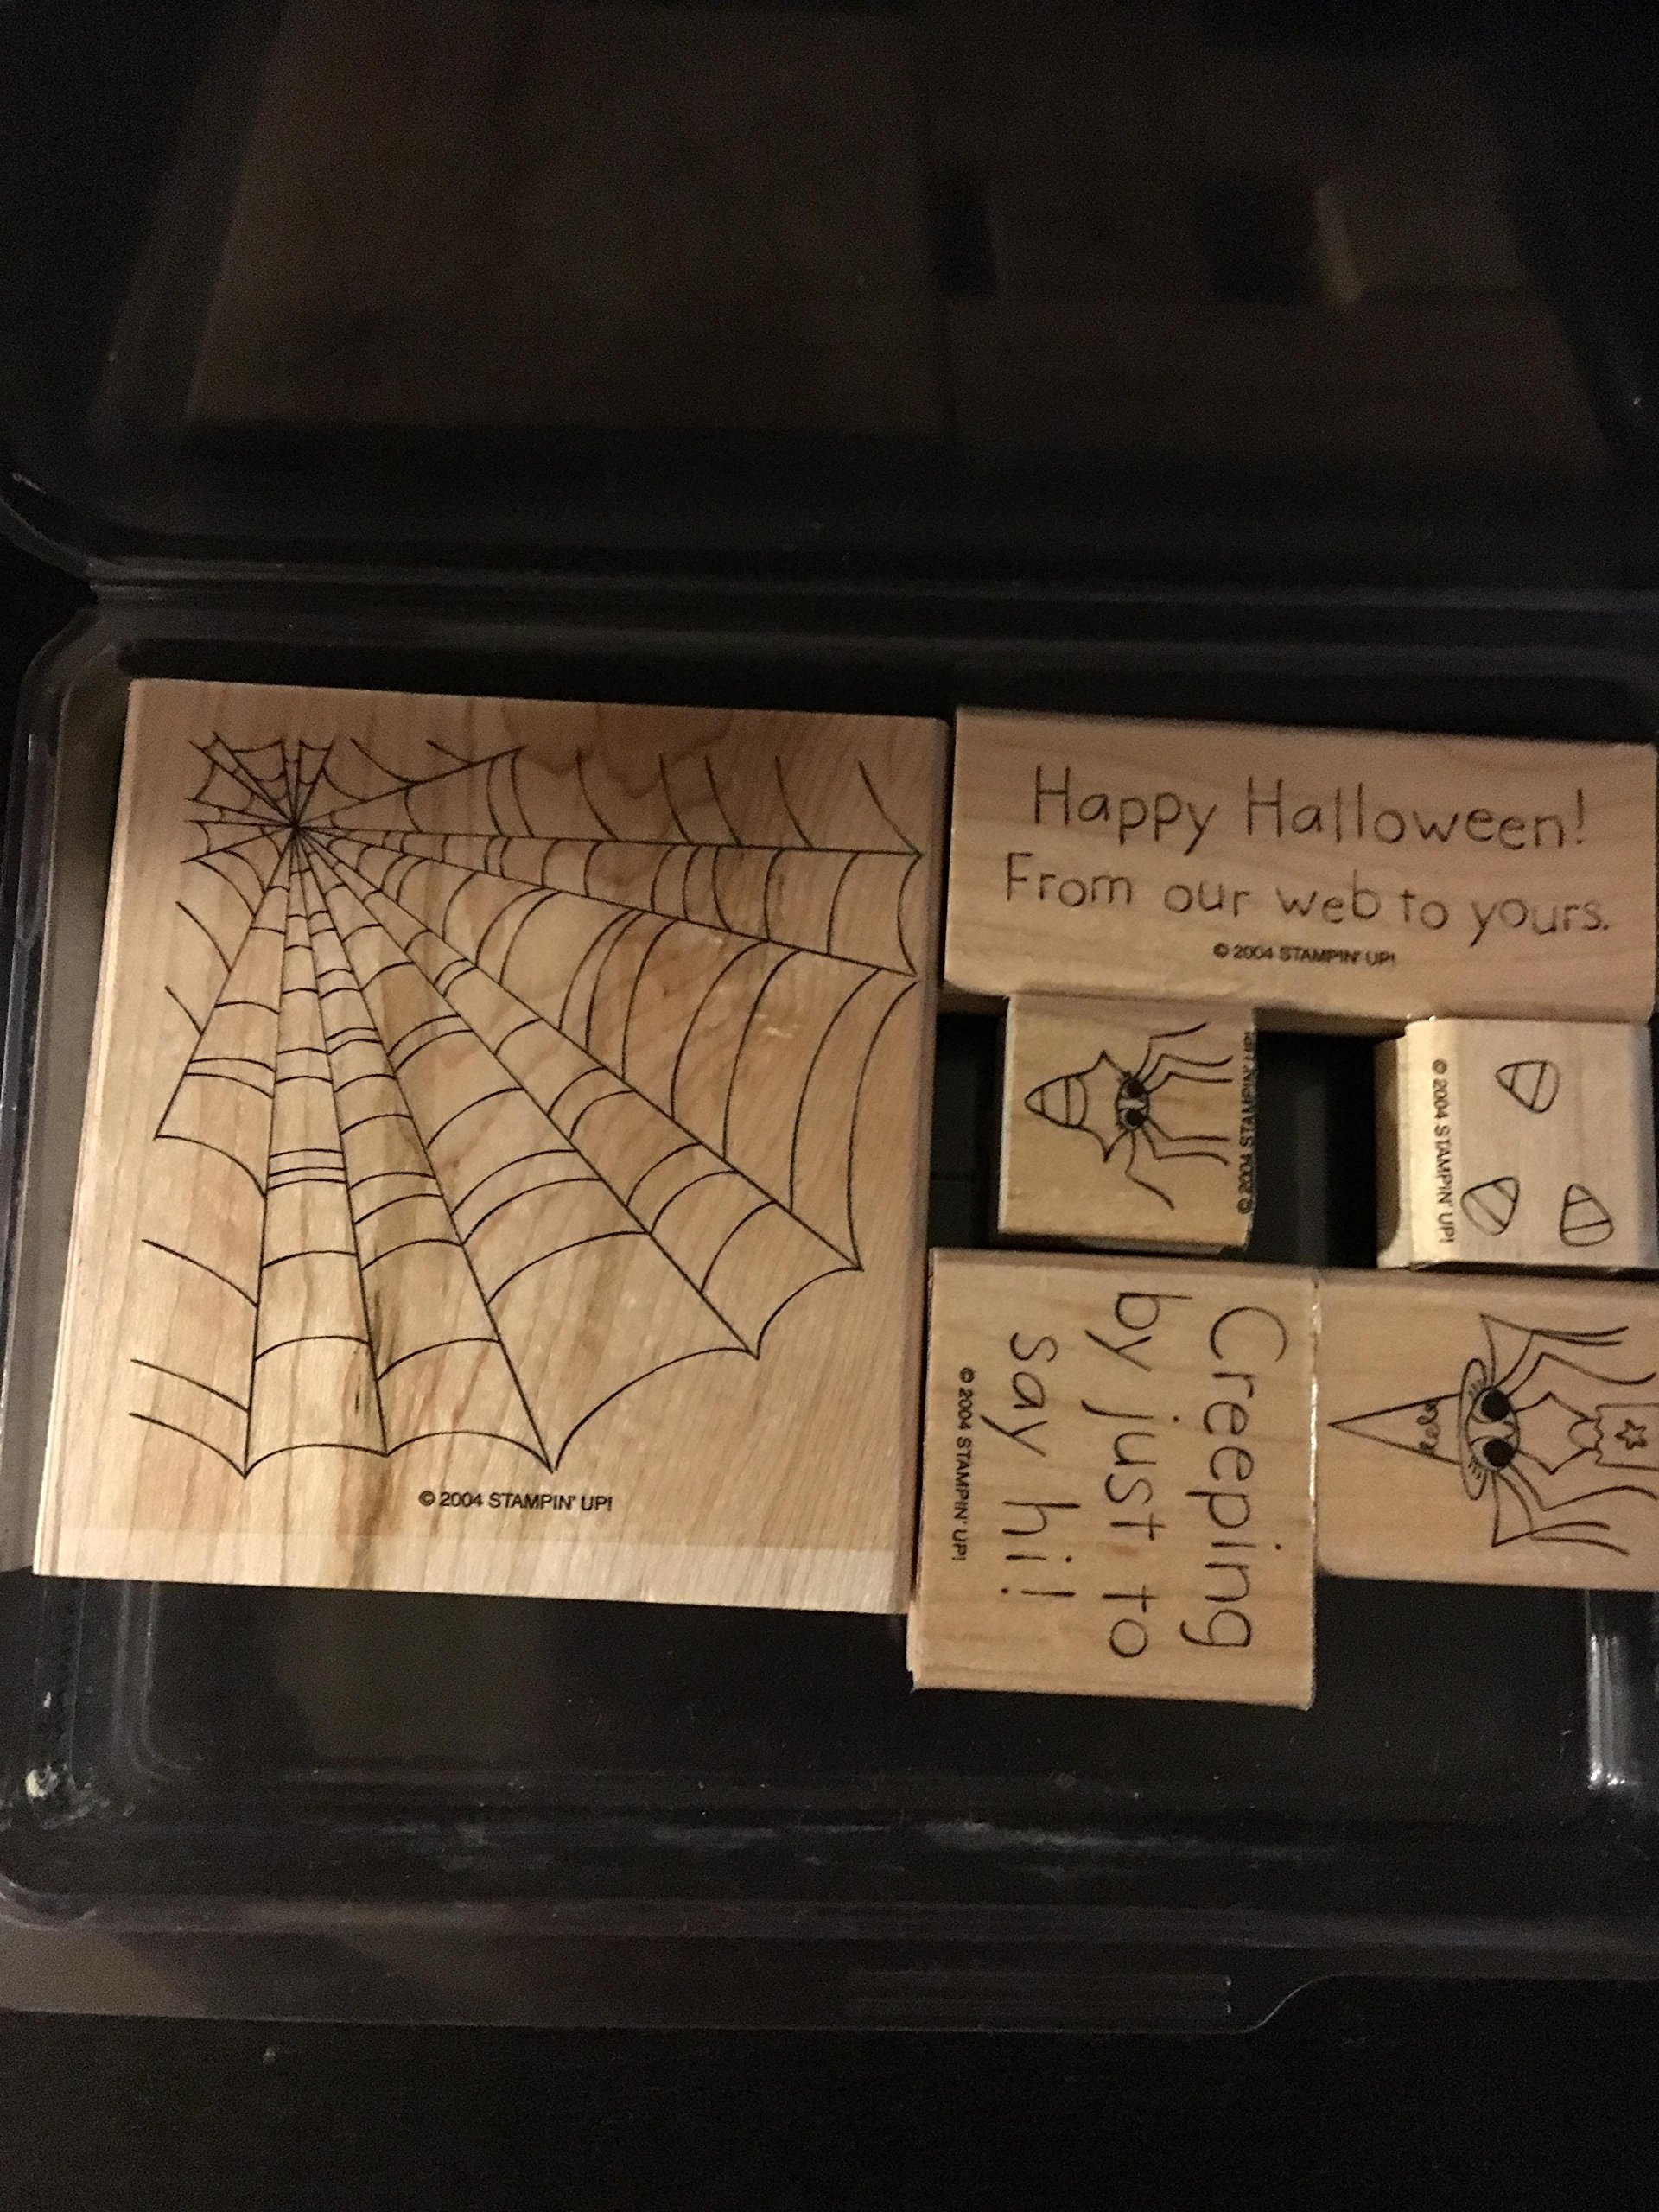 Stampin' Up! Web Wishes Stamp Set